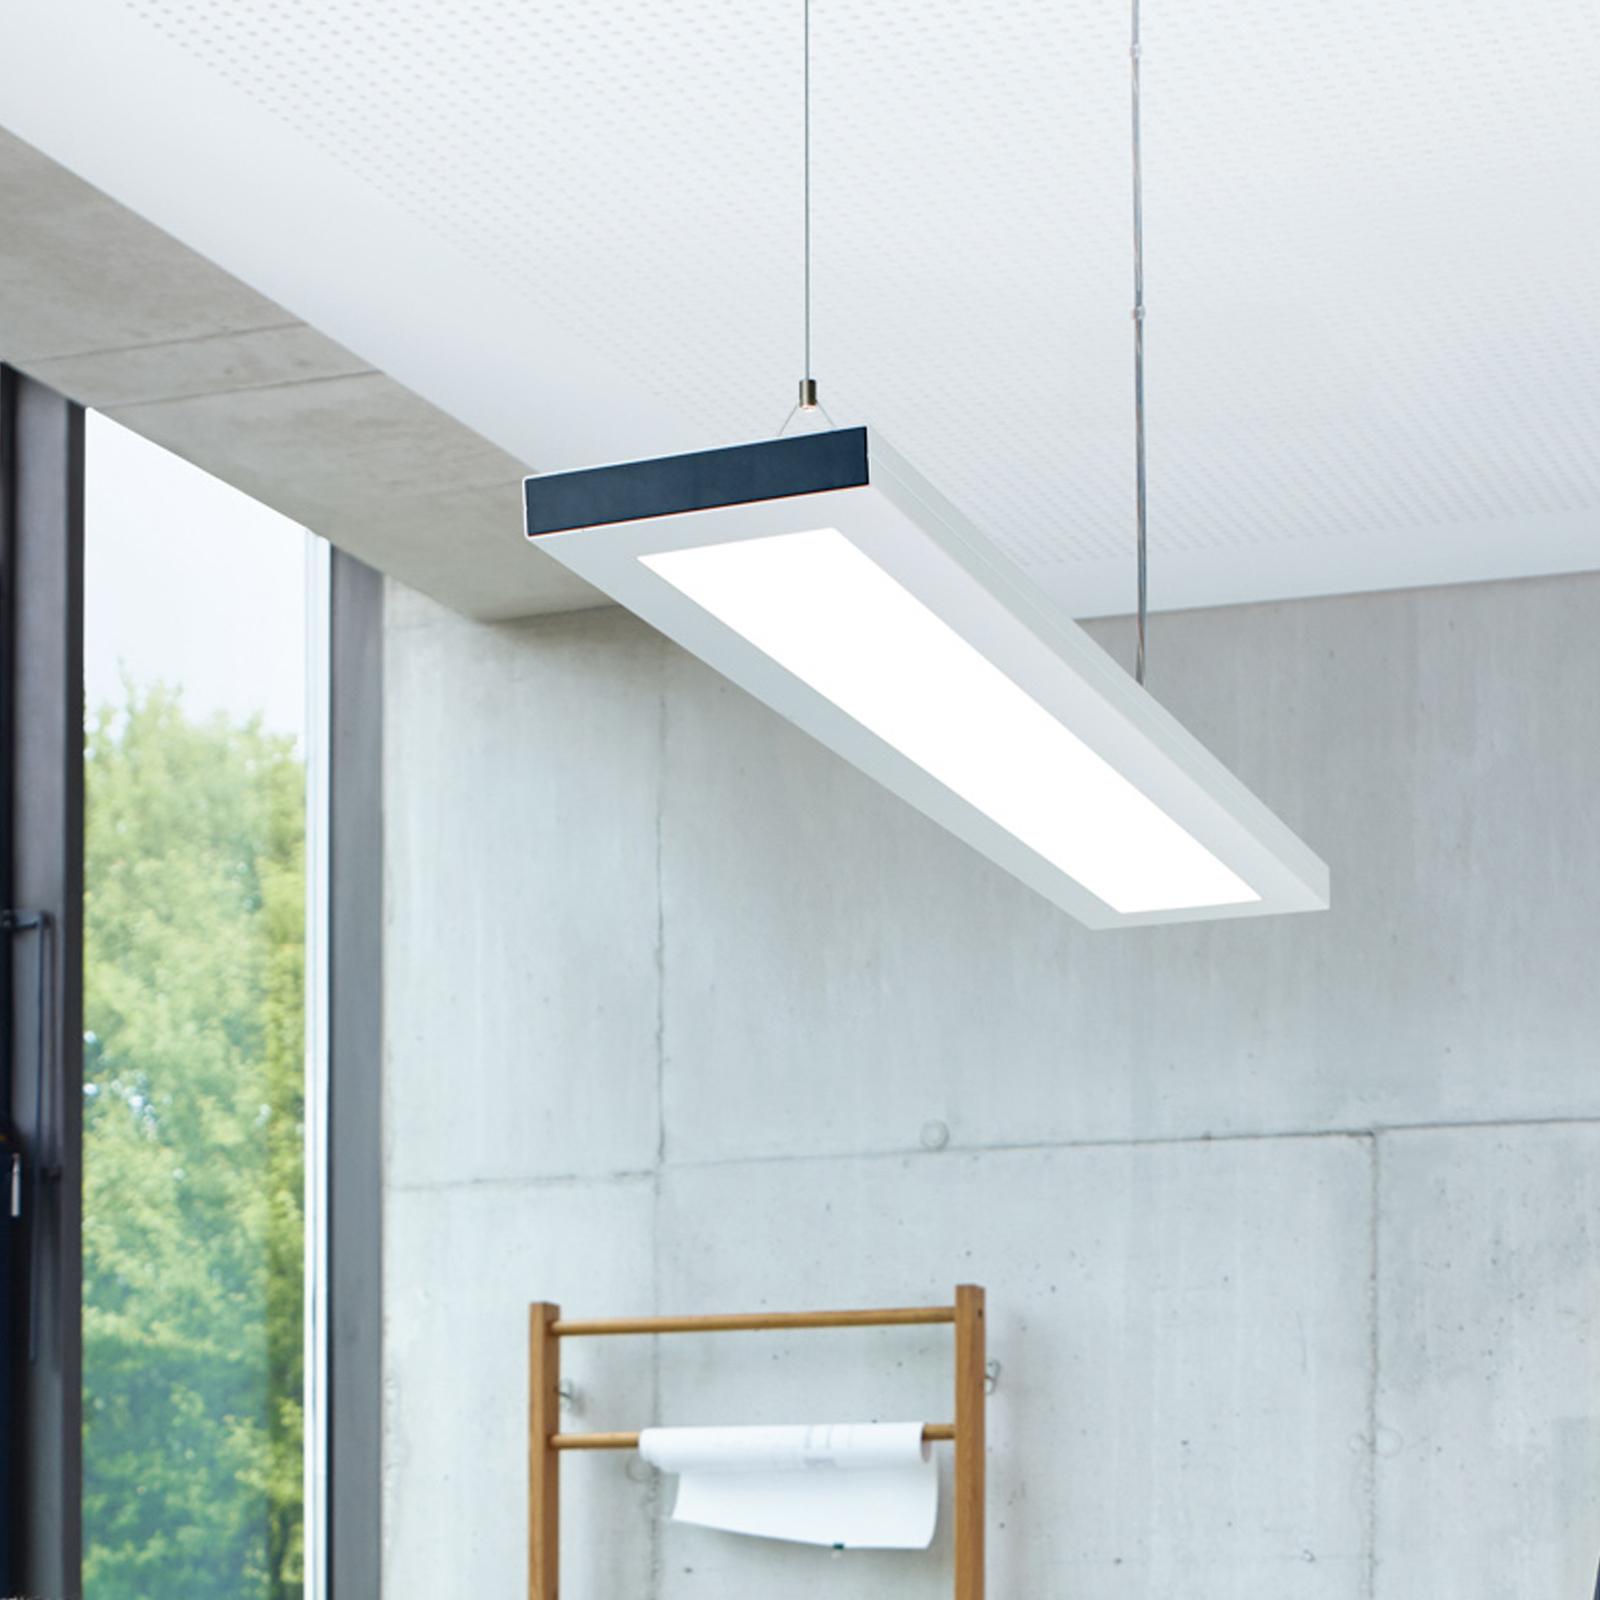 LED-riippuvalaisin Lavigo DPP16000/840/D EL hopea